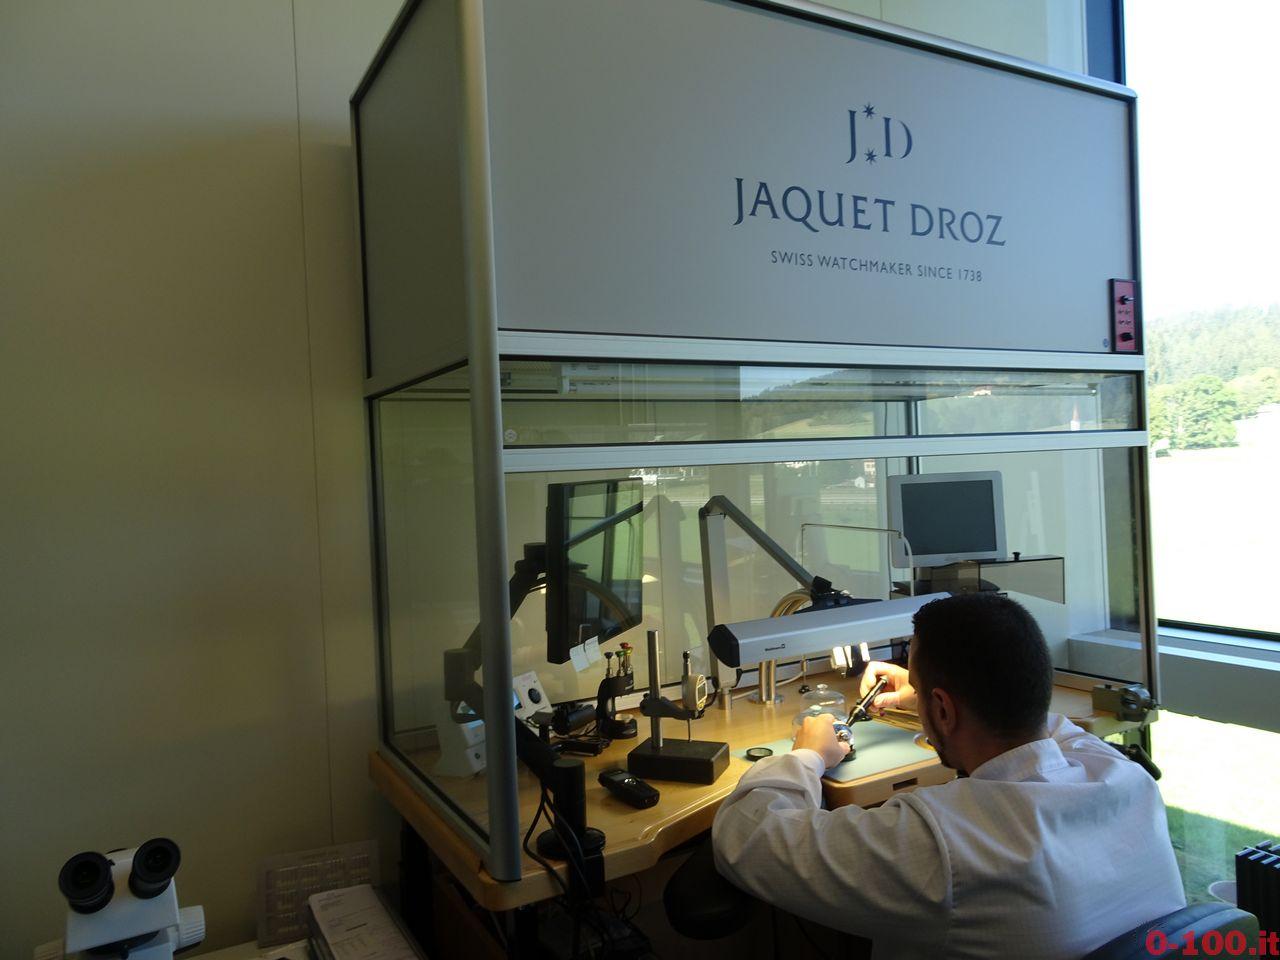 gli-speciali-di-0-100-it-jaquet-droz-la-manifattura-di-la-chaux-de-fonds_0-10021